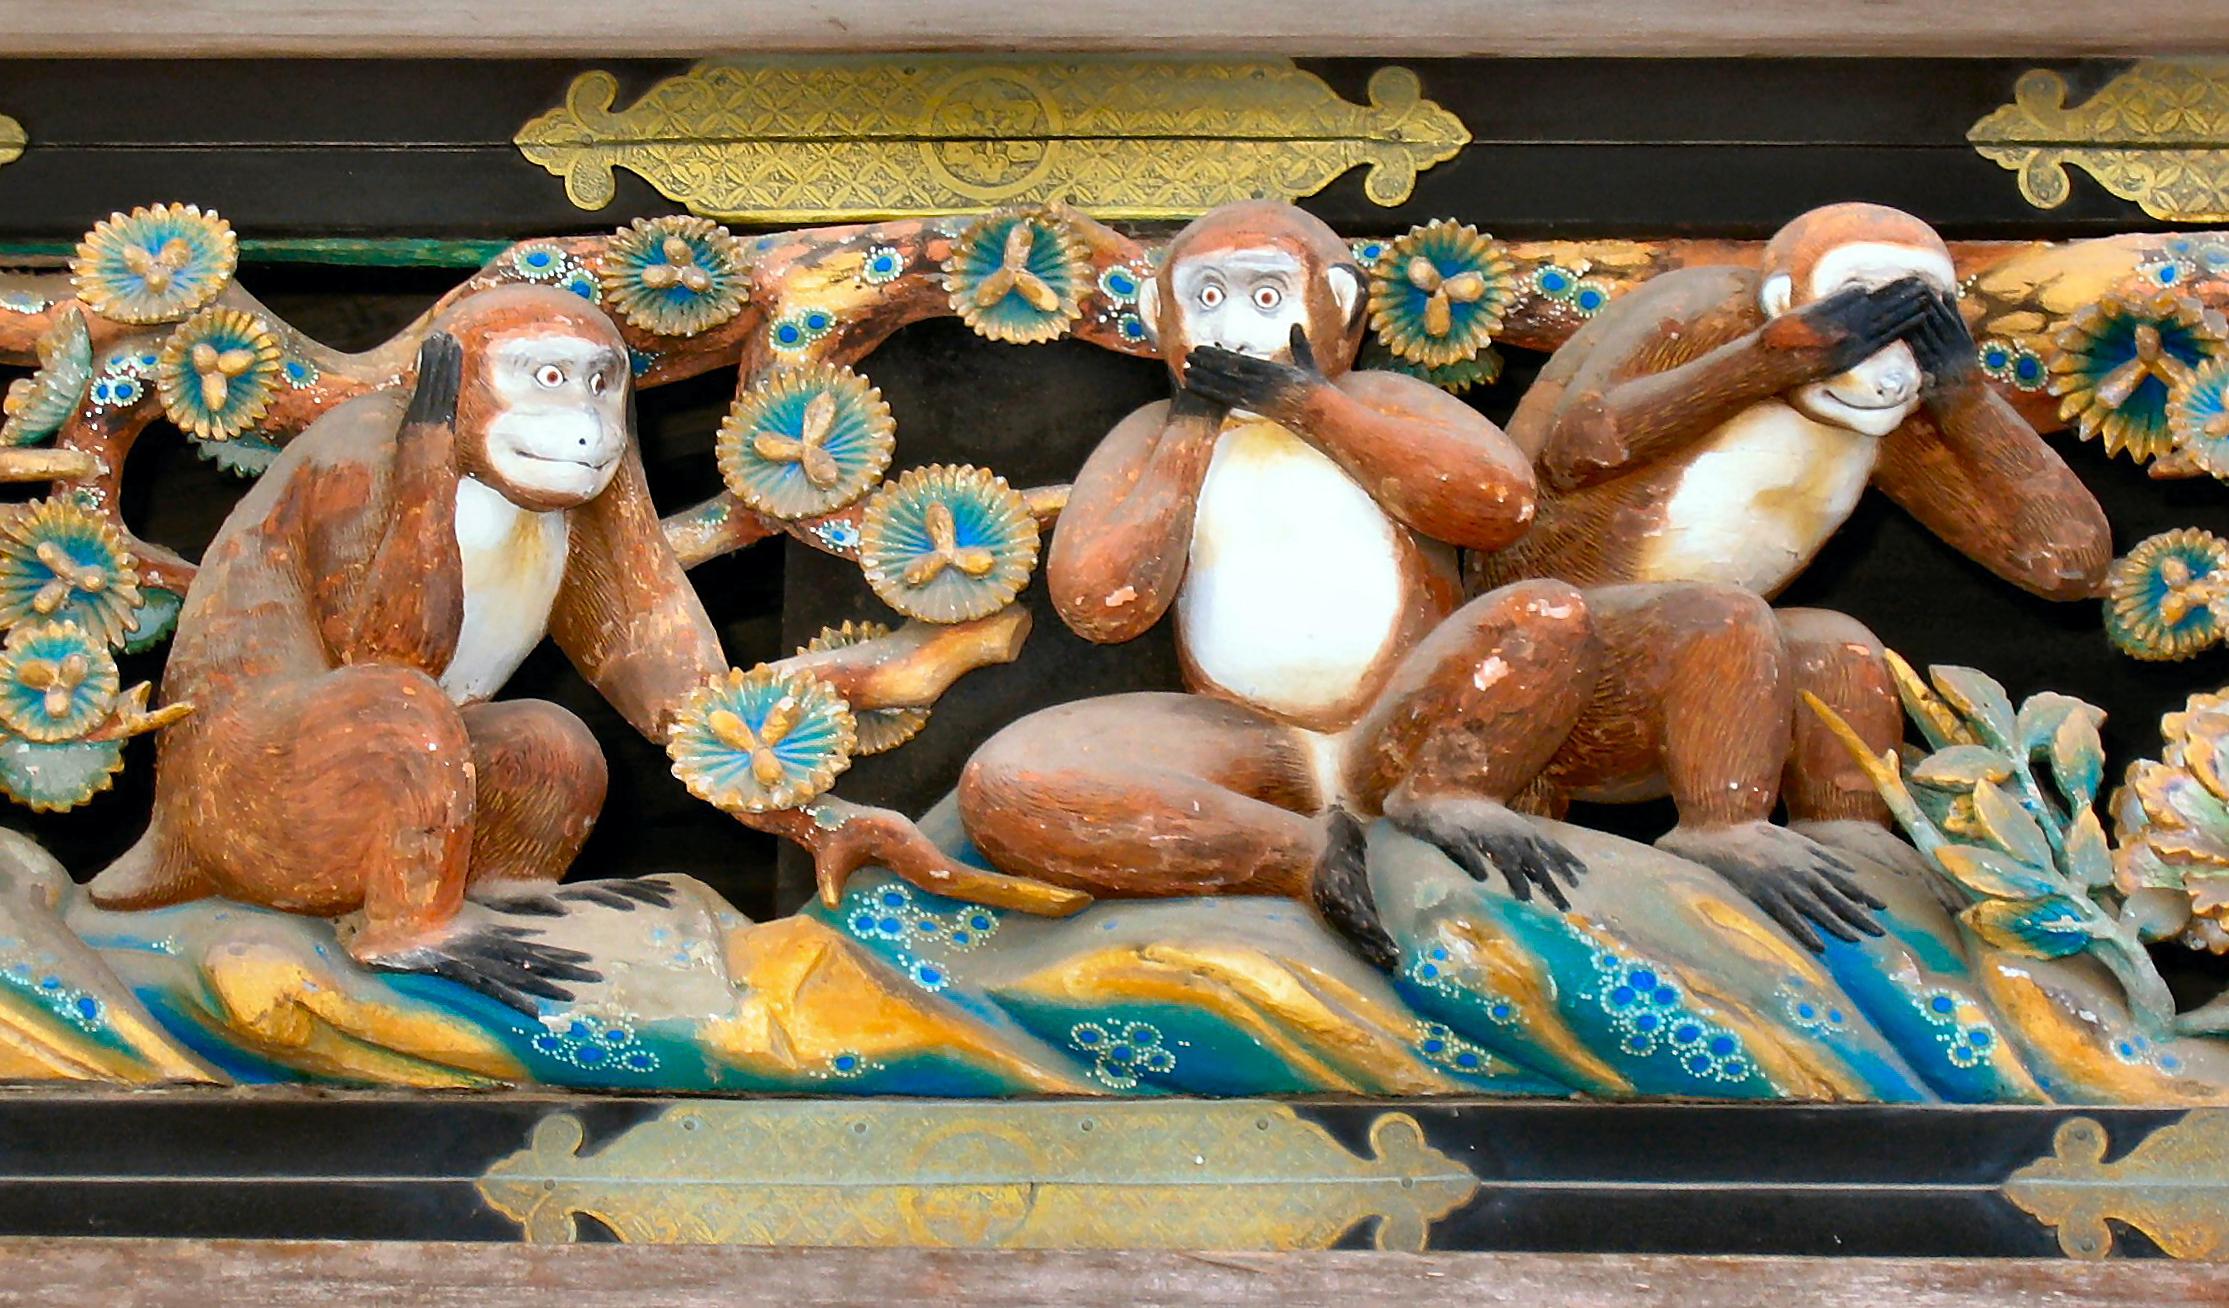 http://upload.wikimedia.org/wikipedia/commons/3/33/Three_Wise_Monkeys%2CTosho-gu_Shrine.JPG